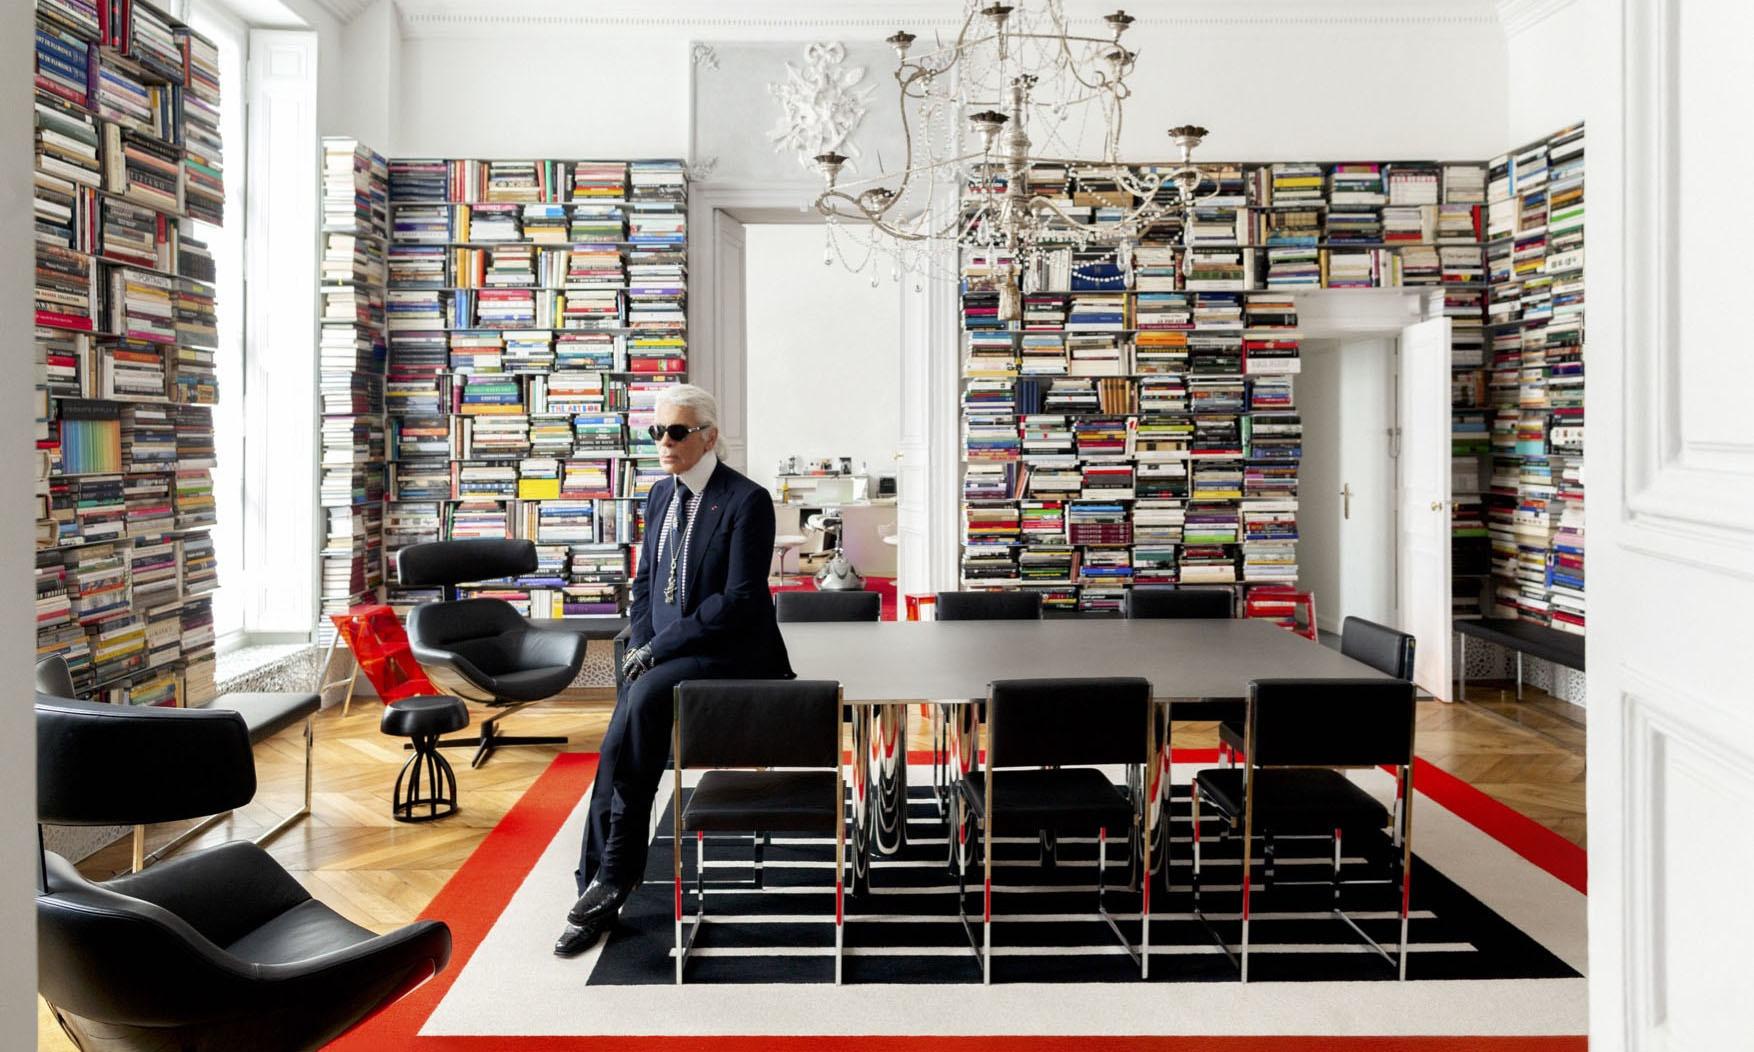 Karl Lagerfeld摩纳哥故居物品将通过苏富比拍卖